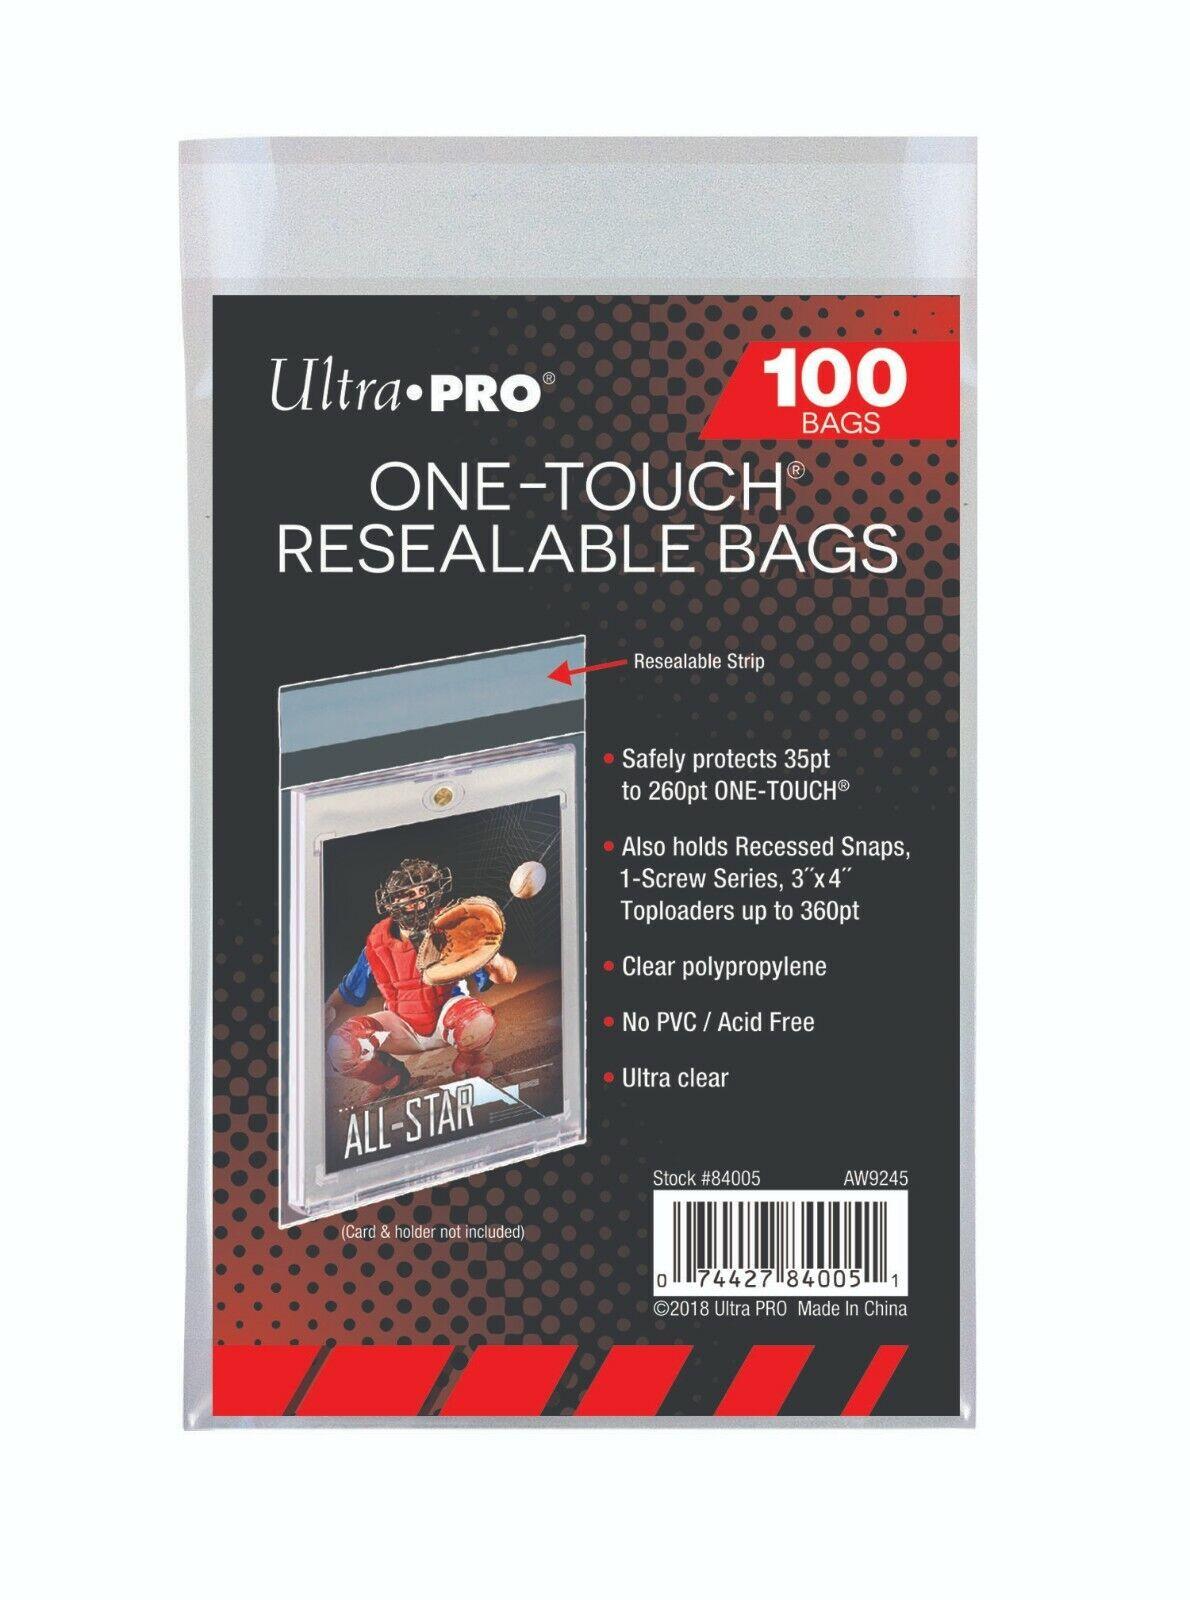 200 bolsas resellable Ultra Pro ONE Touch Nuevo Tornillo Toploader manga de tarjeta magnética